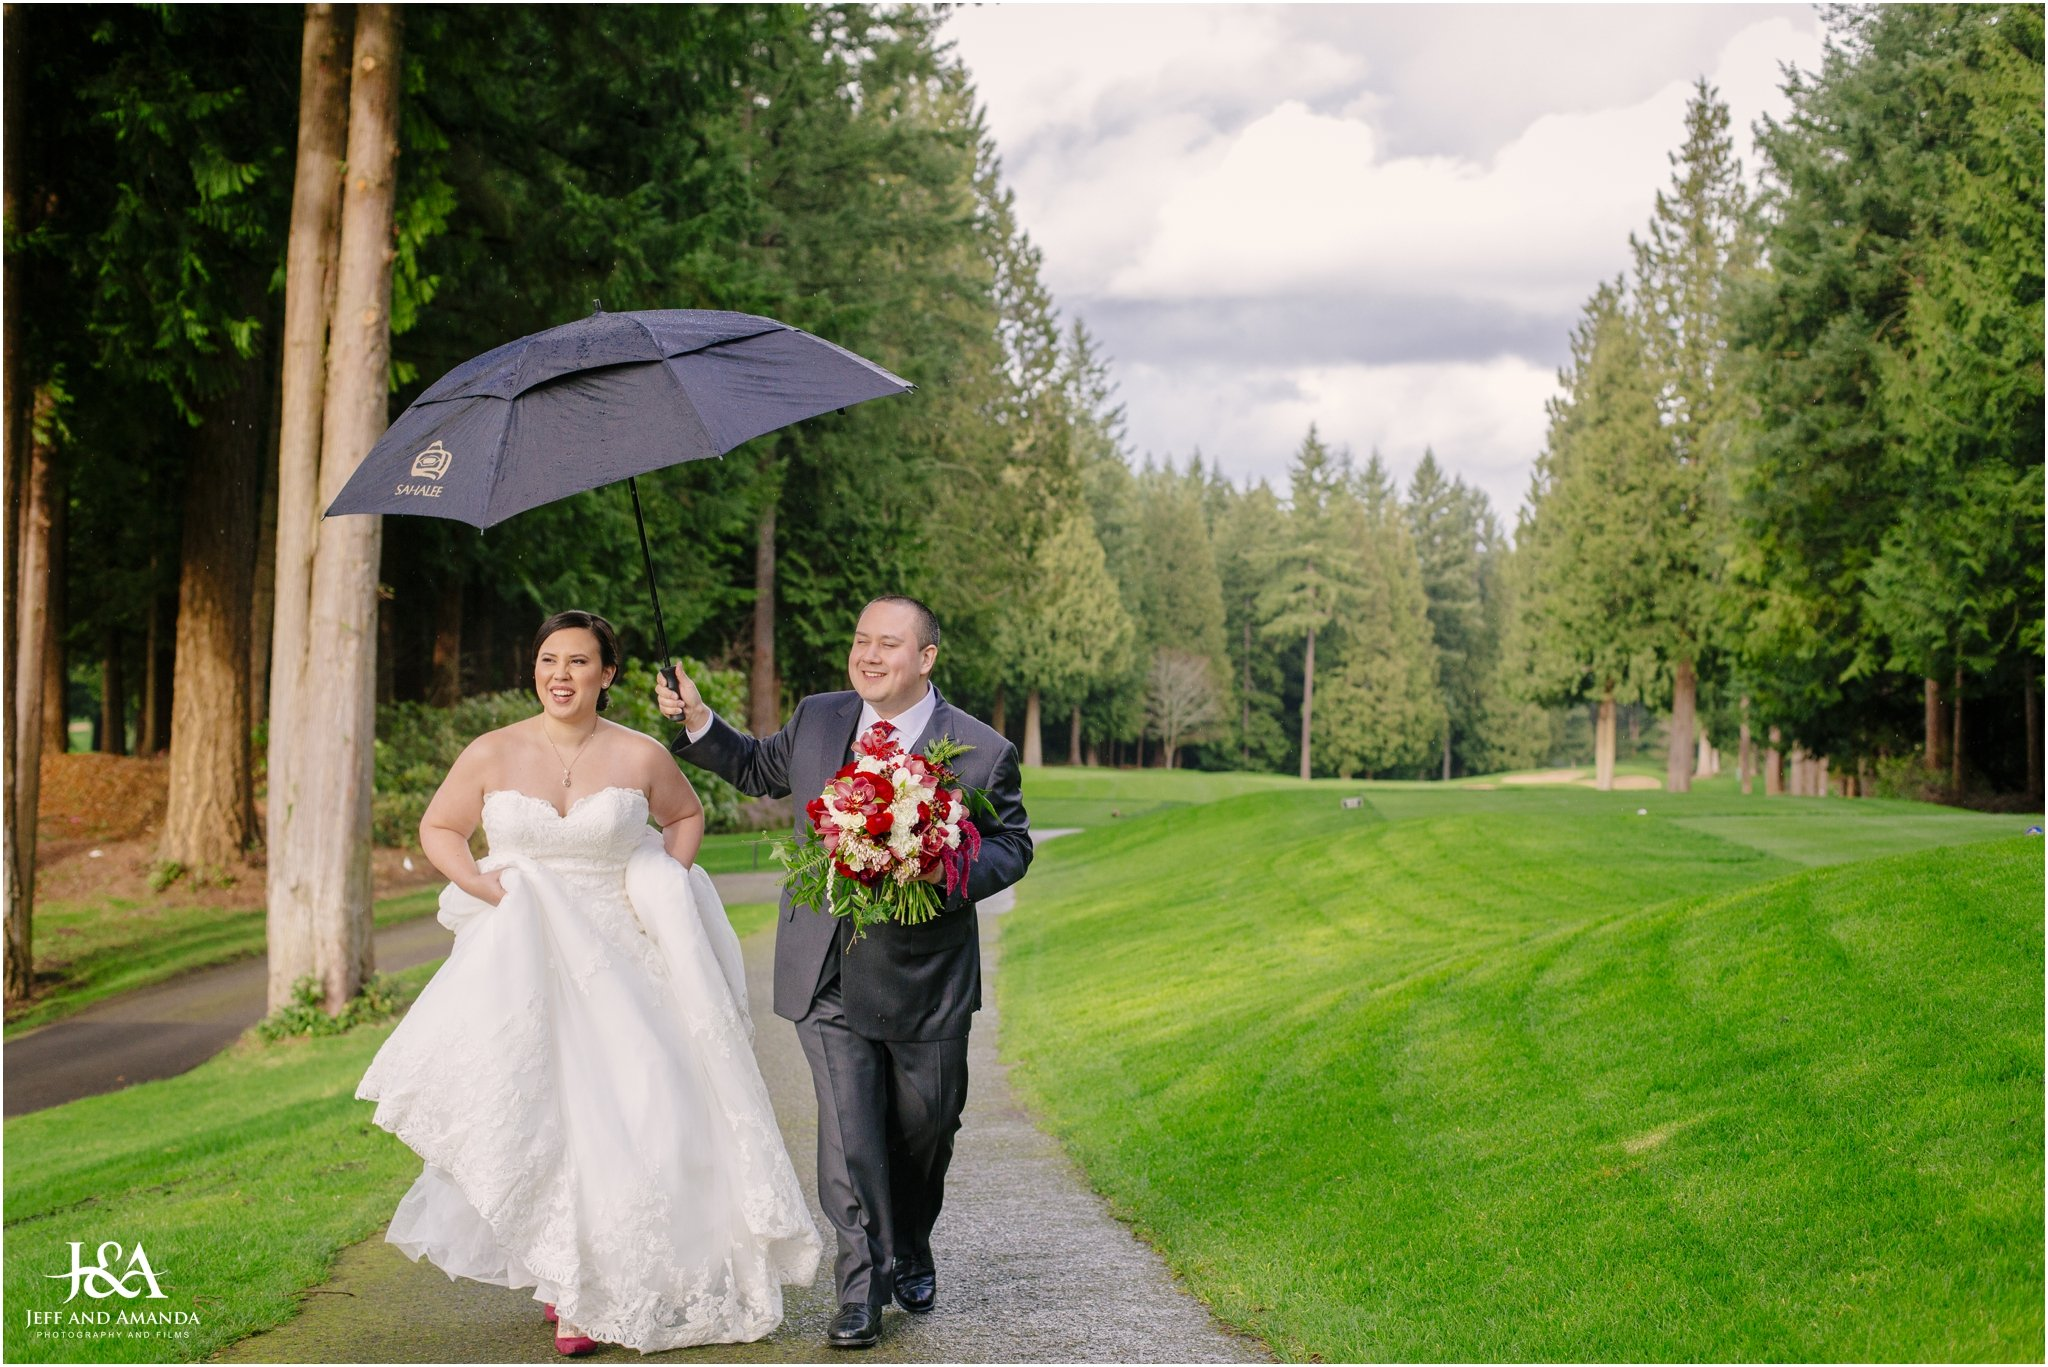 Dave and Kari s Wedding-Facebook Ready-0187.jpg